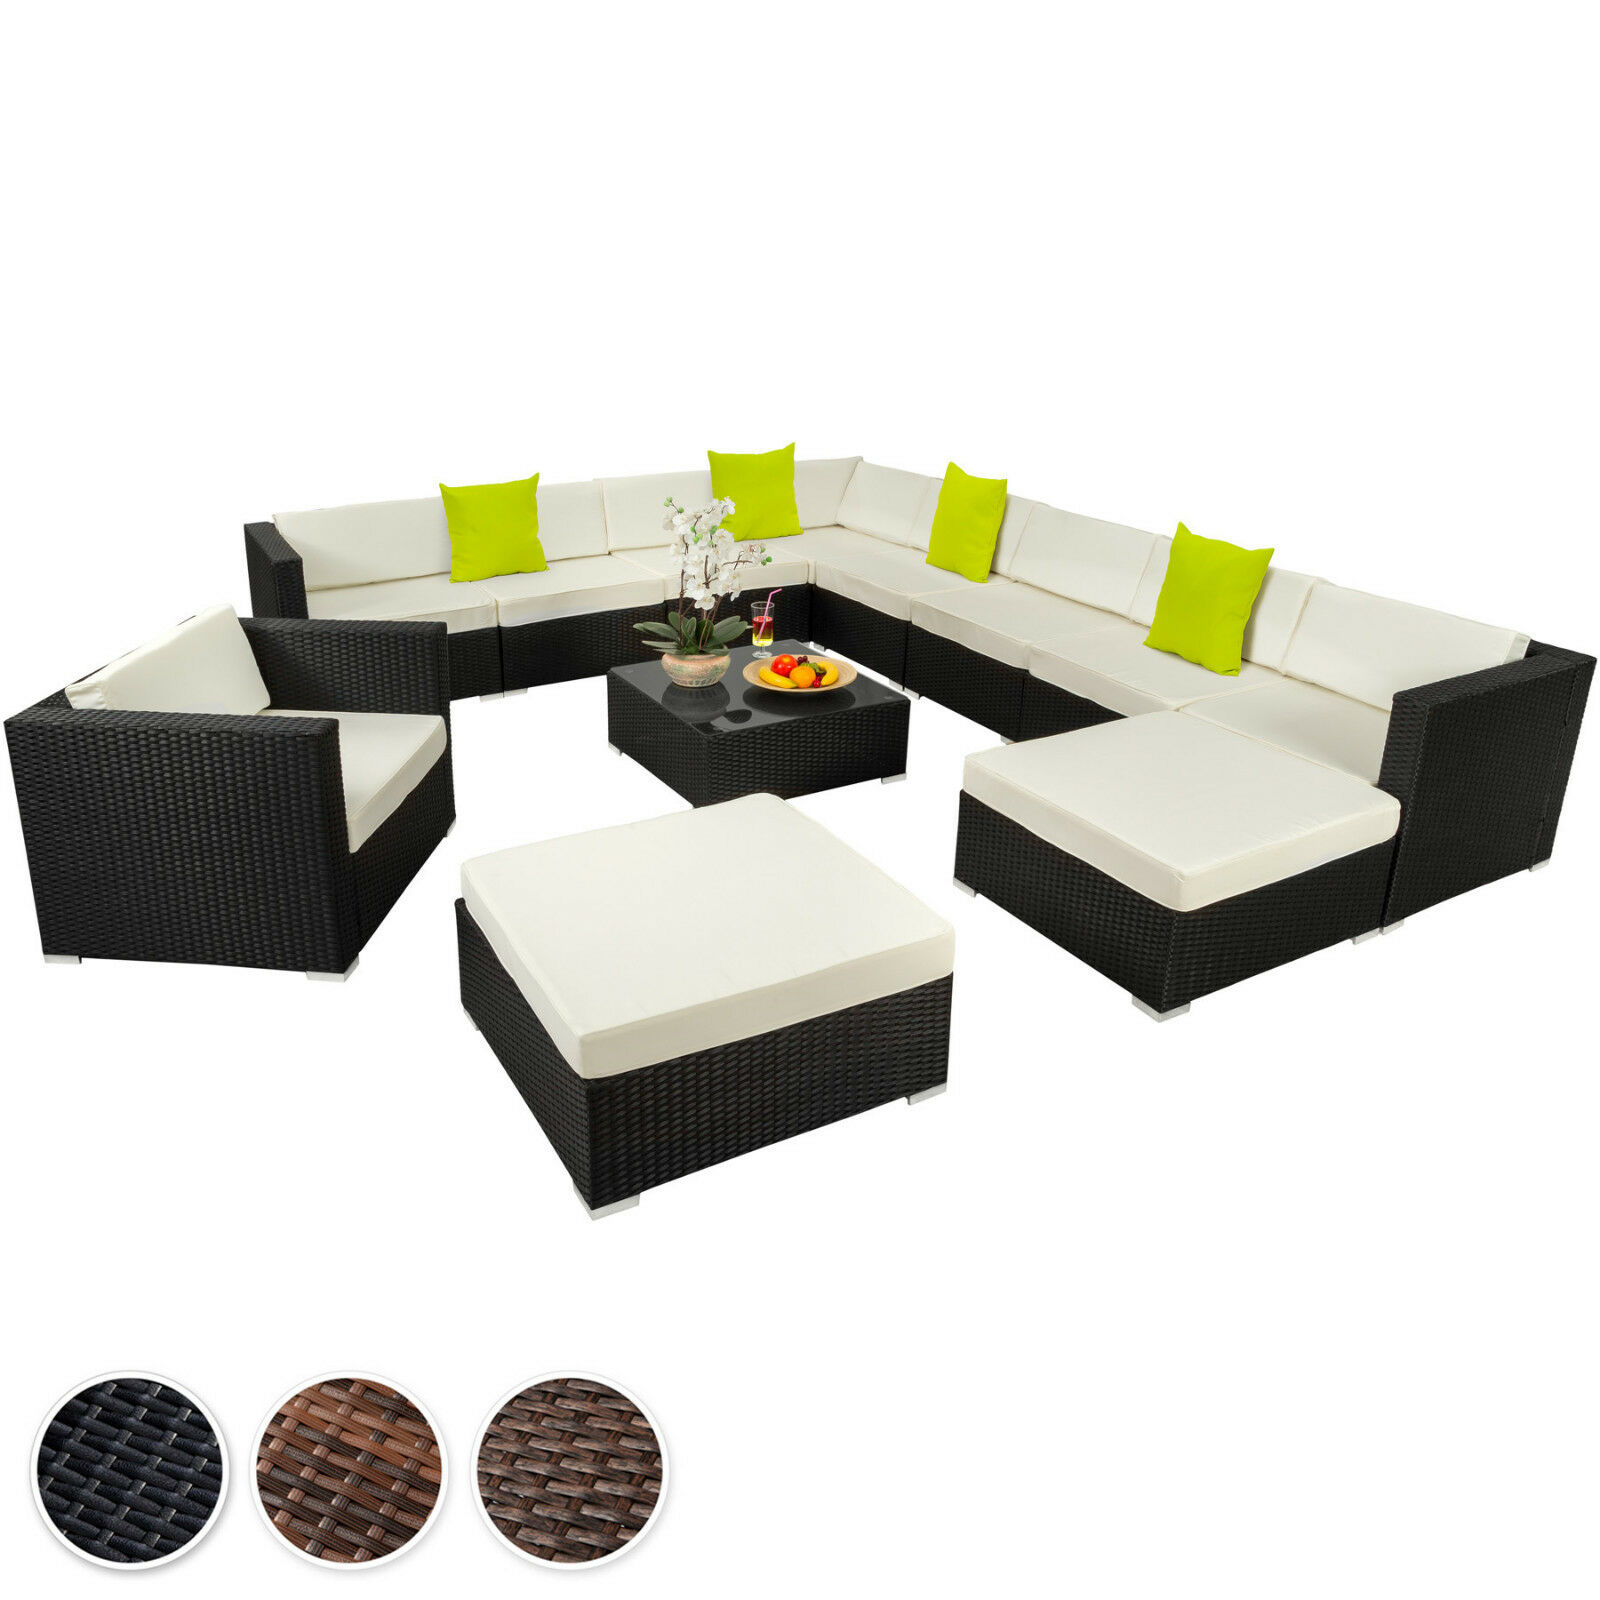 Svita Polyrattan Lounge Gartenmöbel Set Sofa Couch